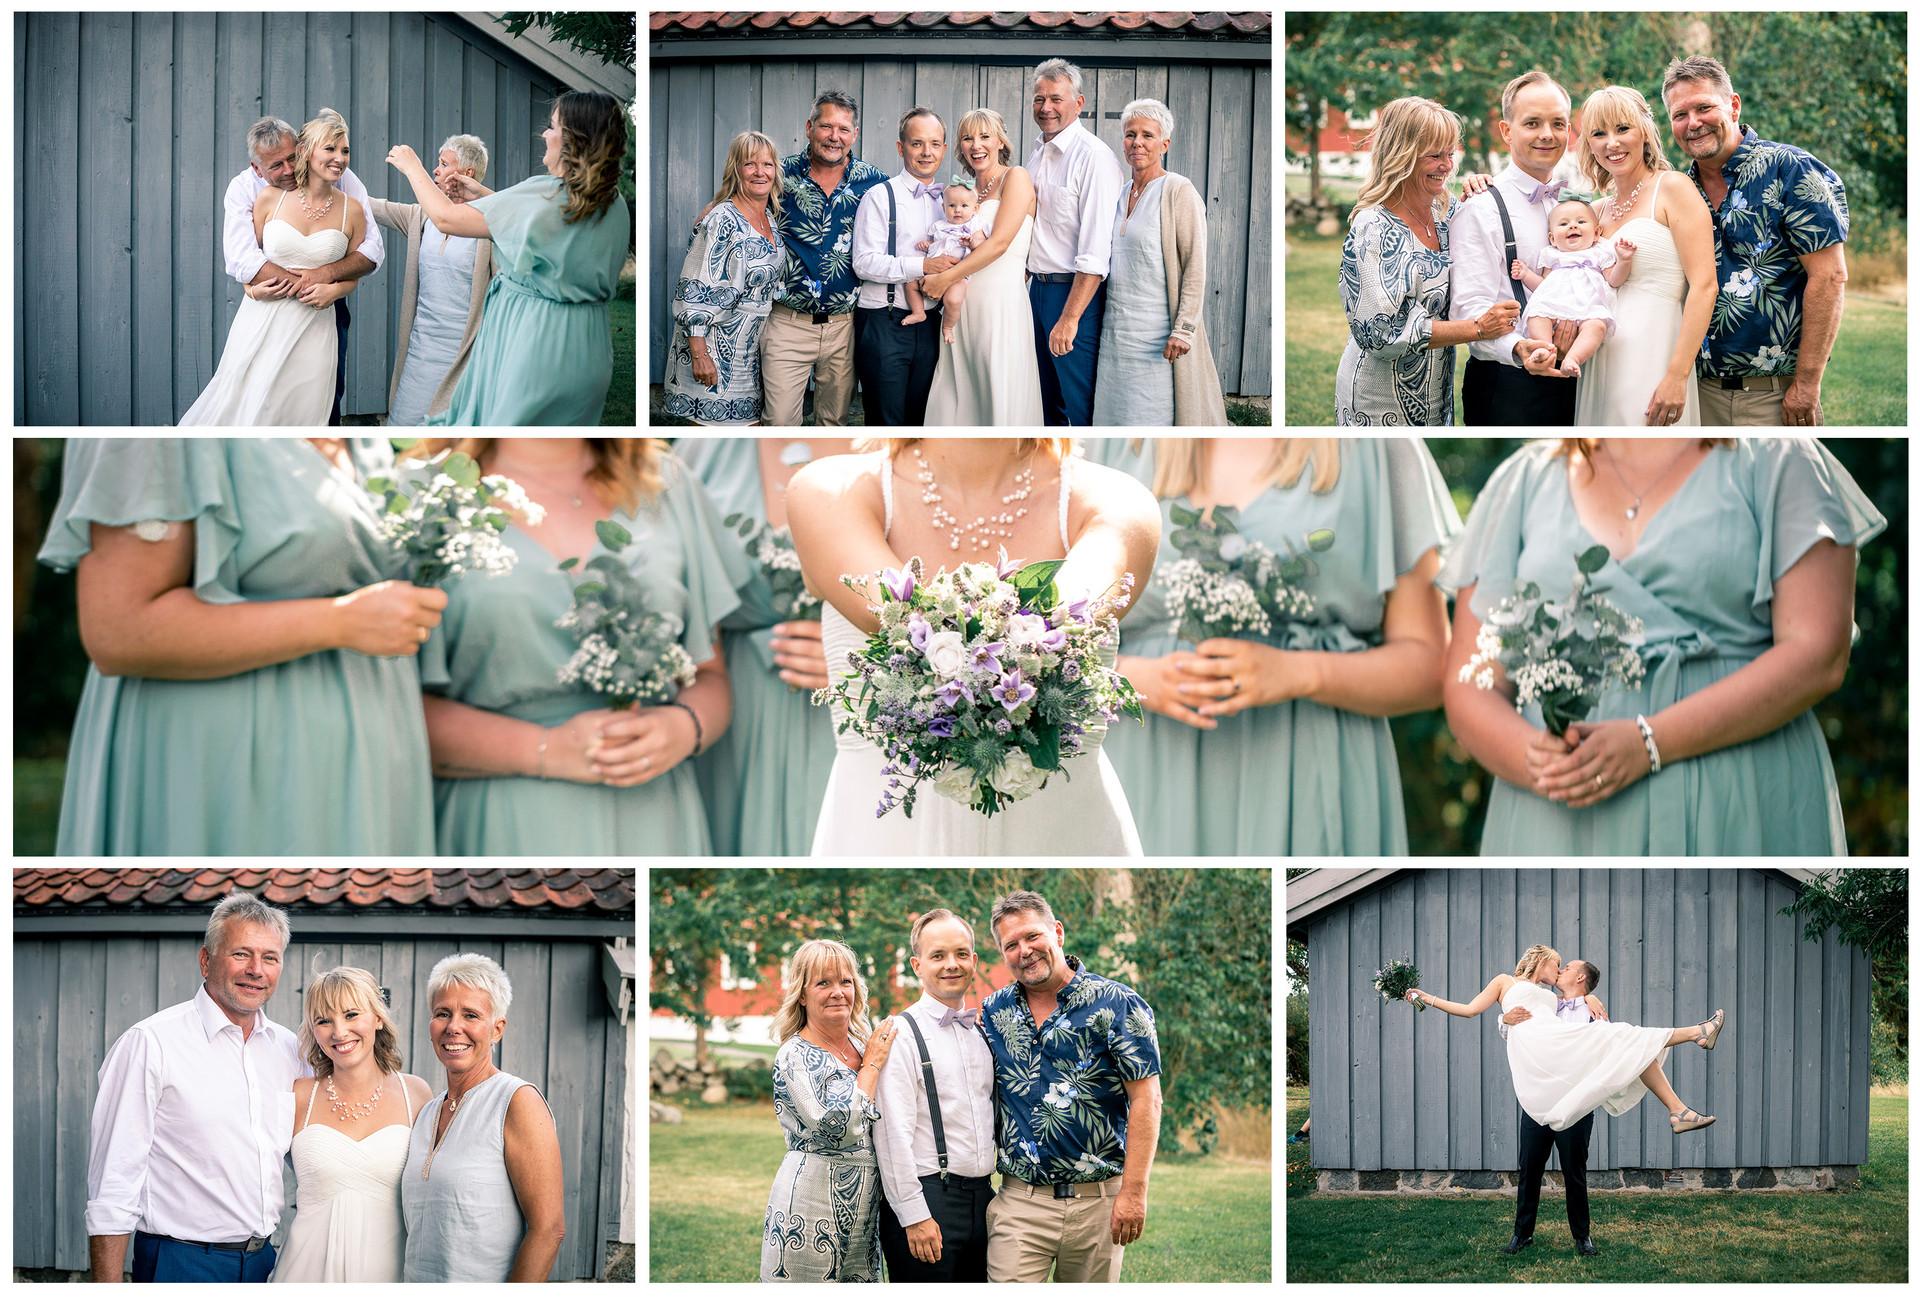 Wedding-Photography-Goteborg-07.jpg